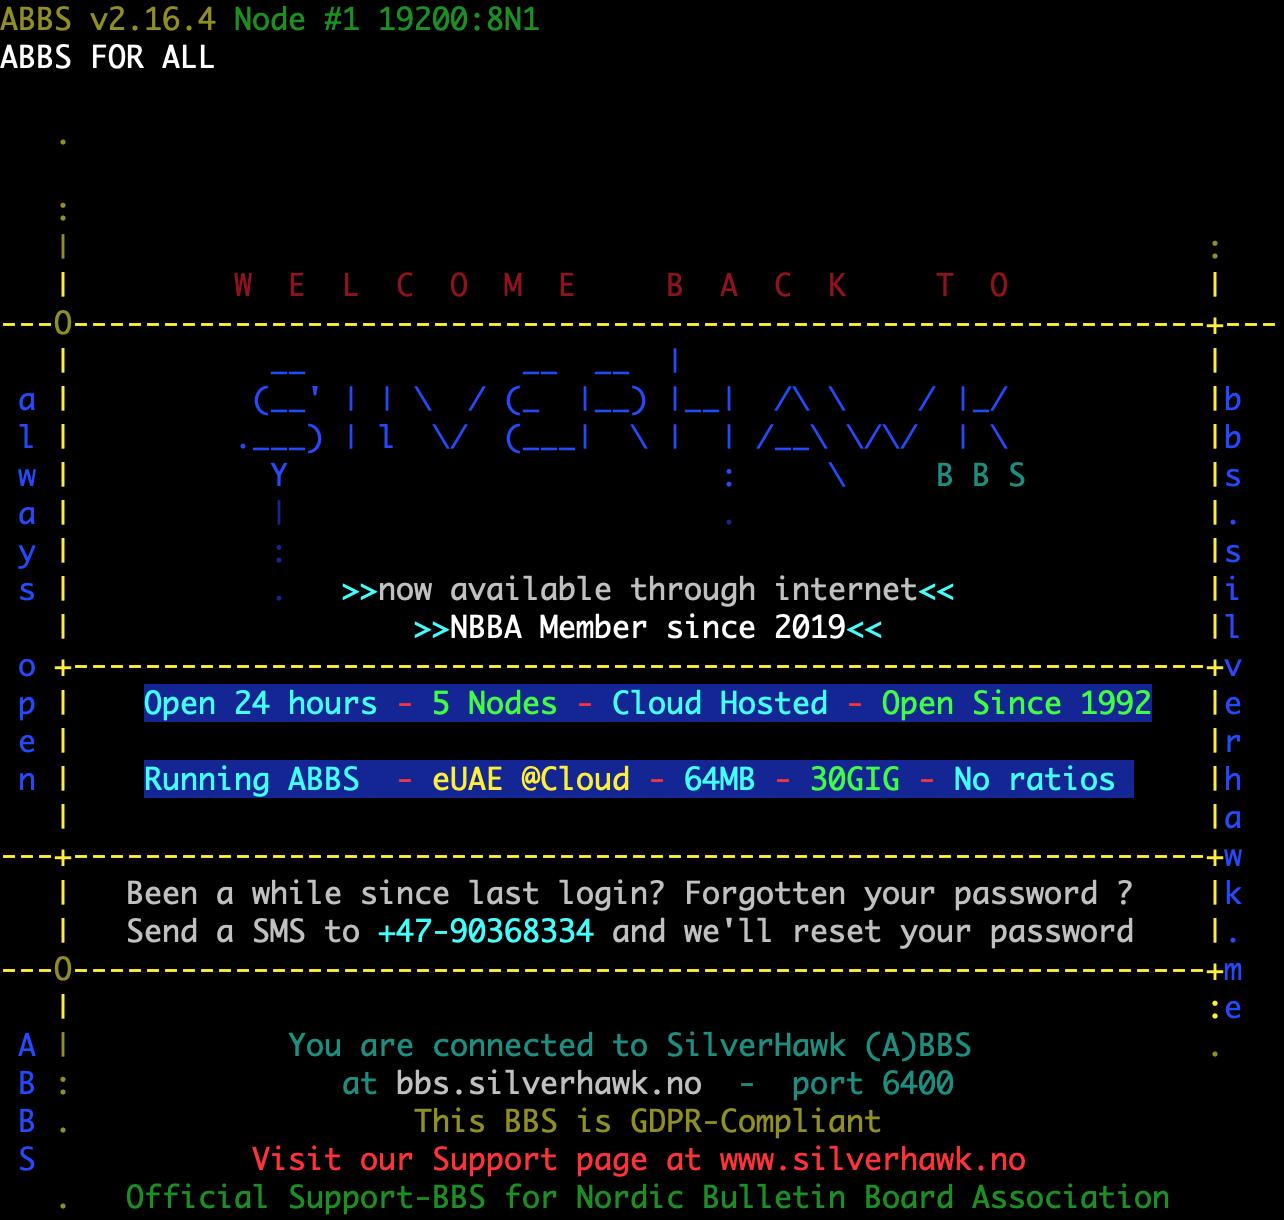 silverhawk-bbs